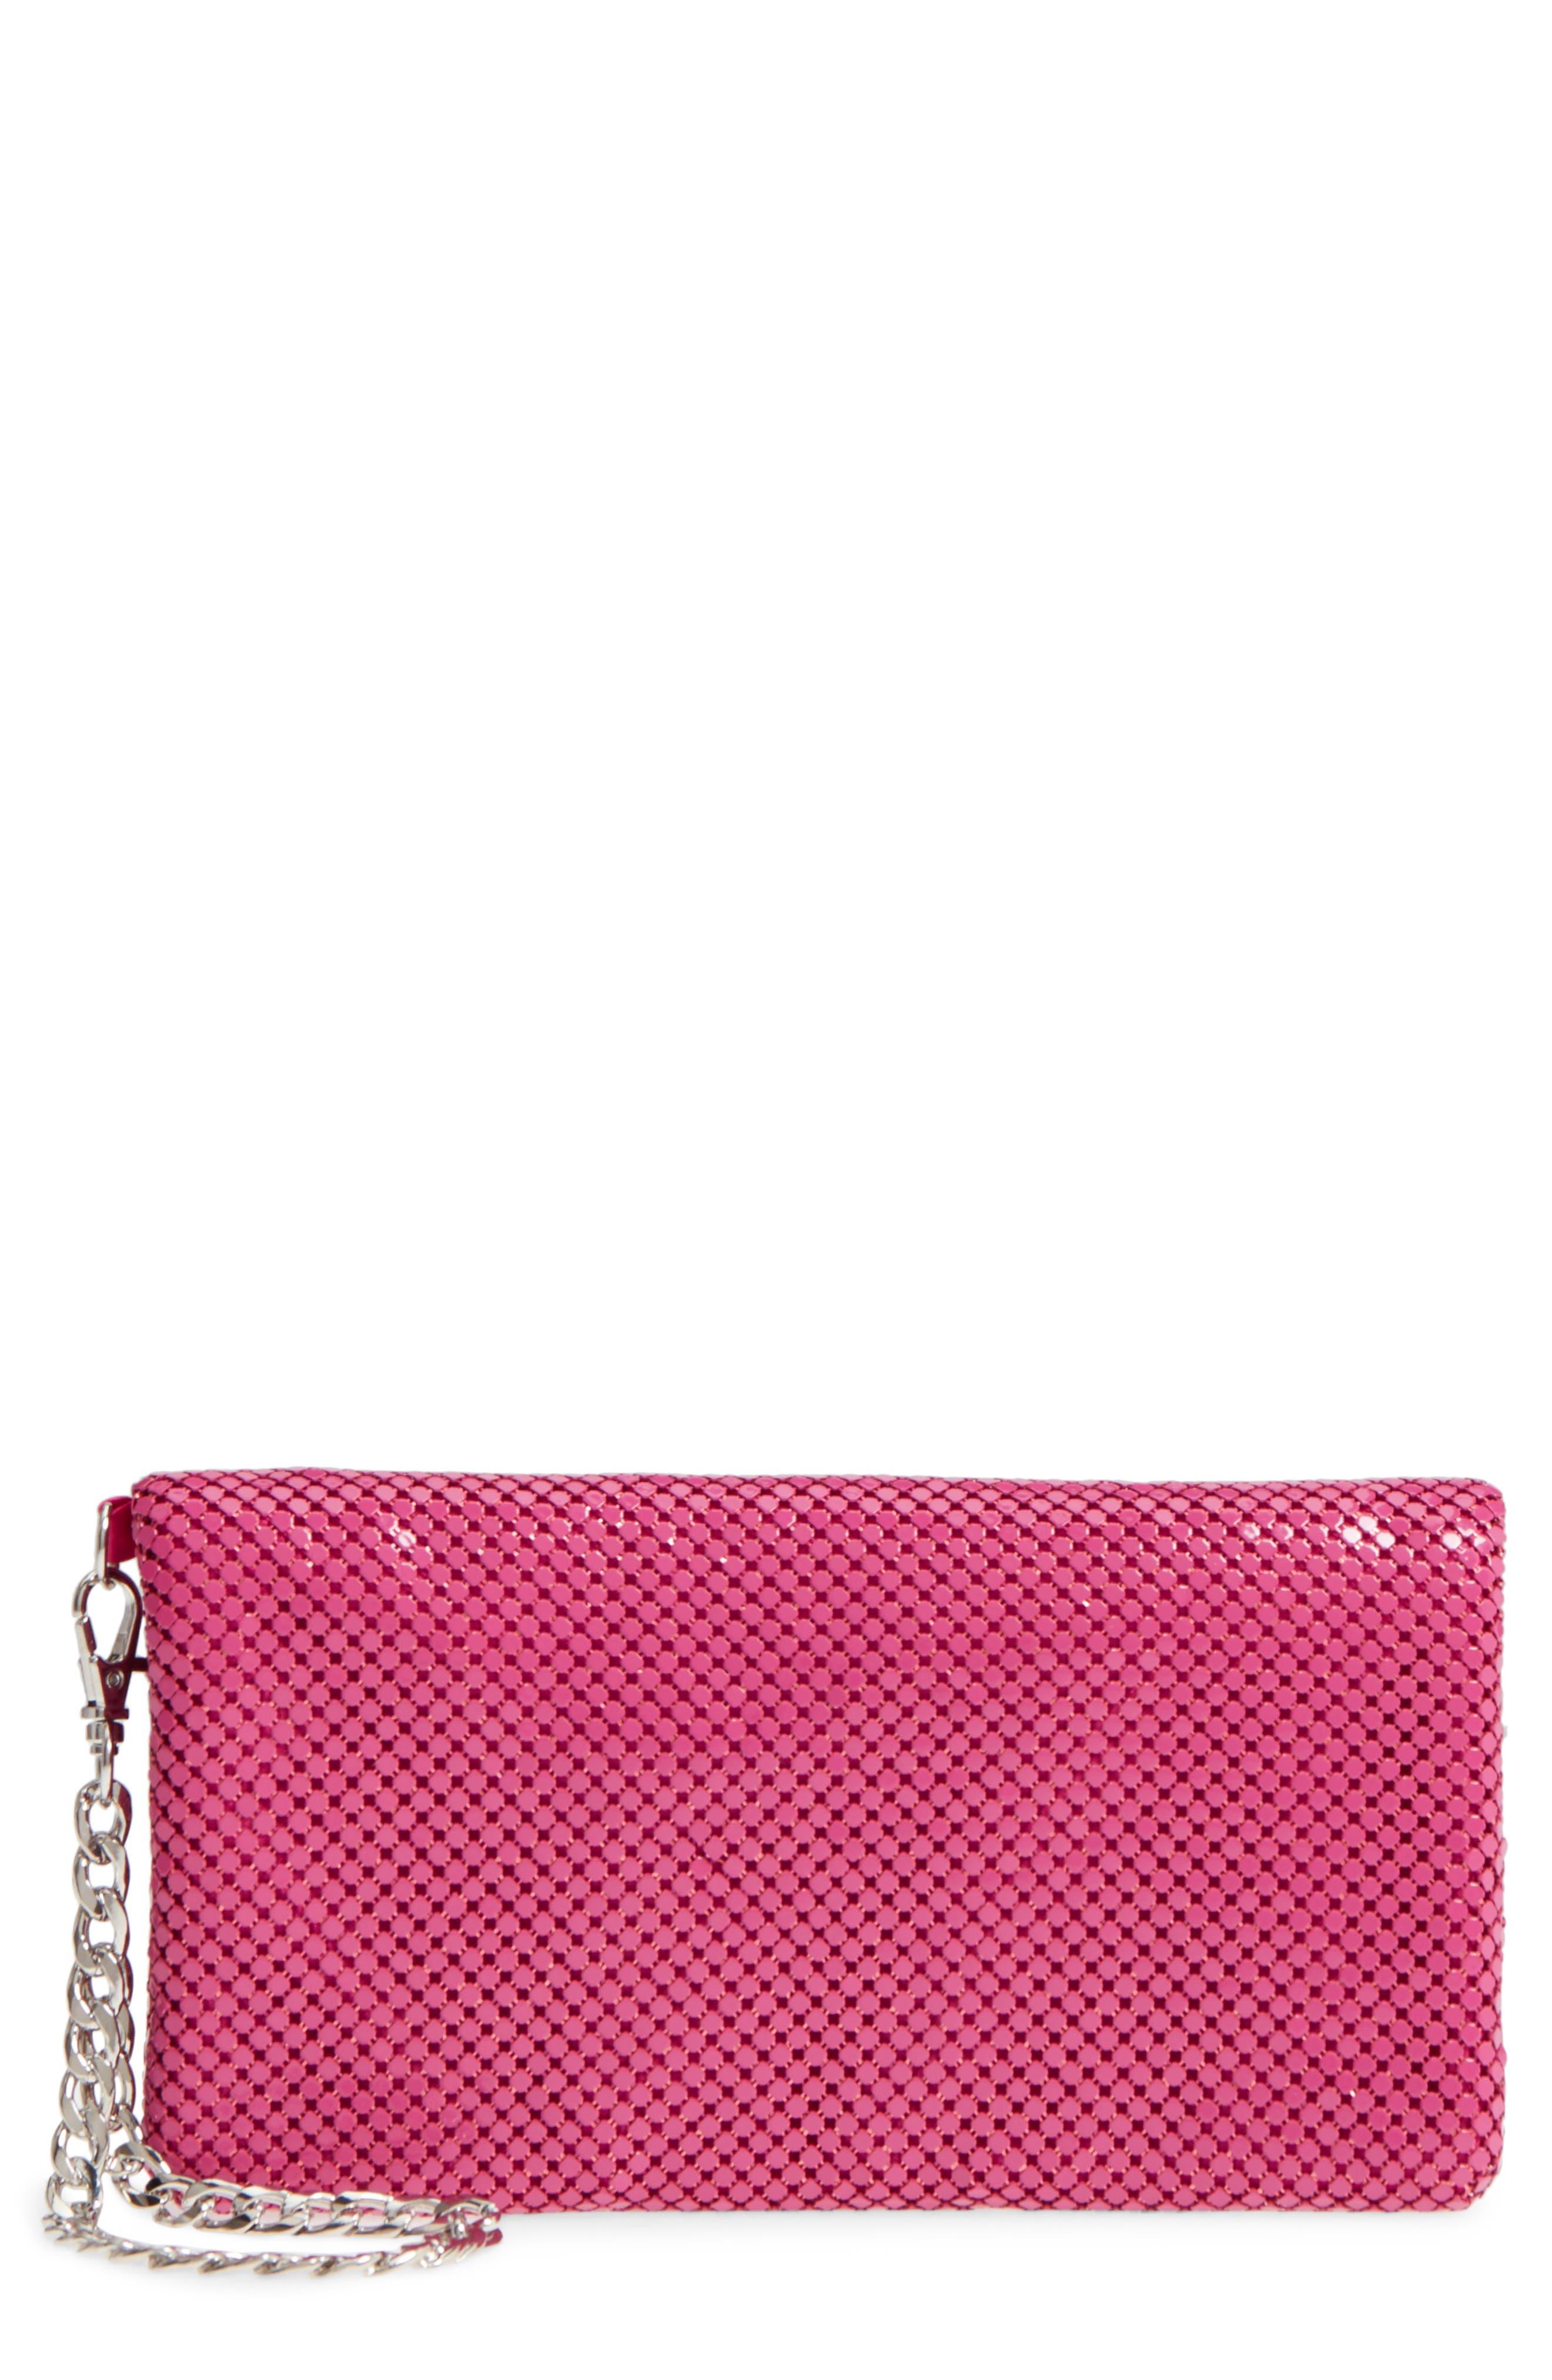 Mesh Wristlet,                         Main,                         color, Pink Fuchsia